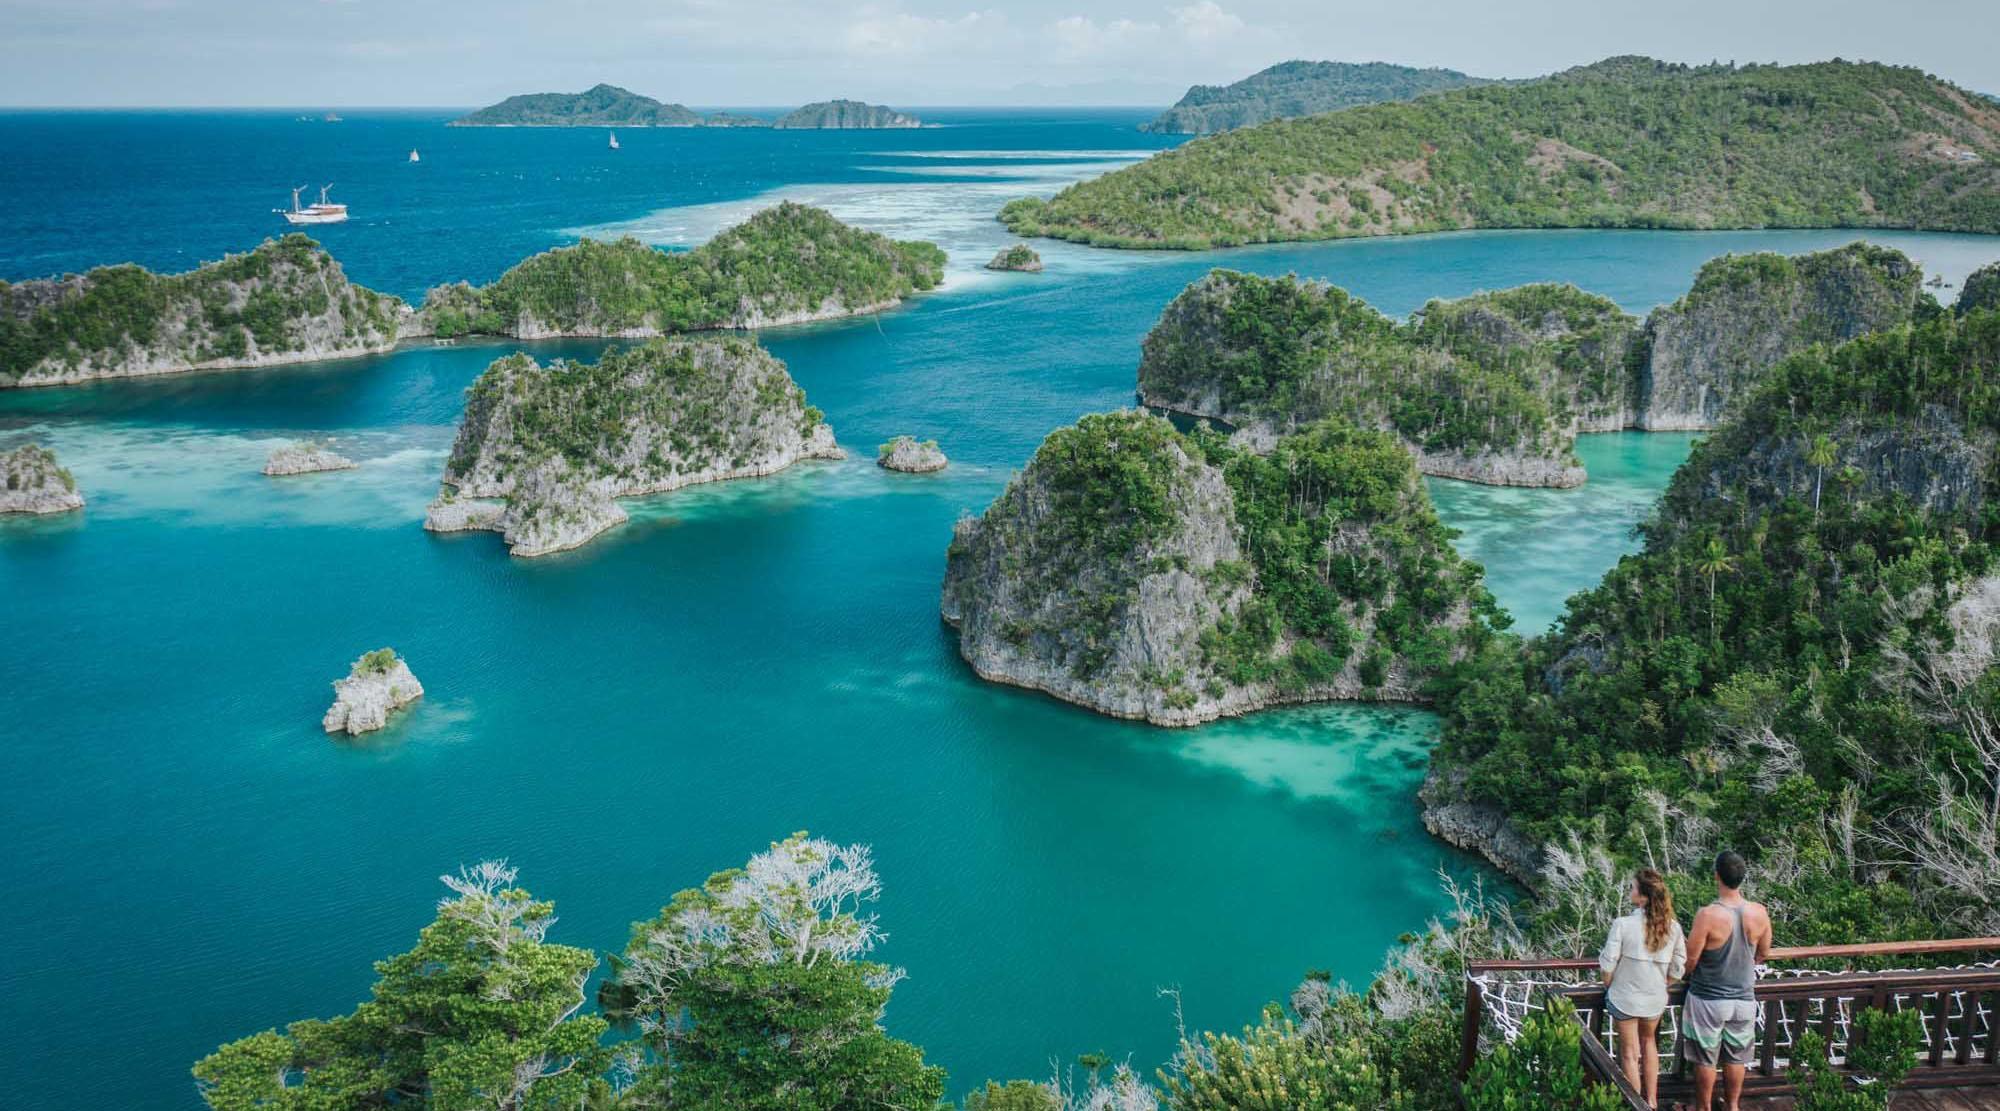 du lịch Raja Ampat Indonesia